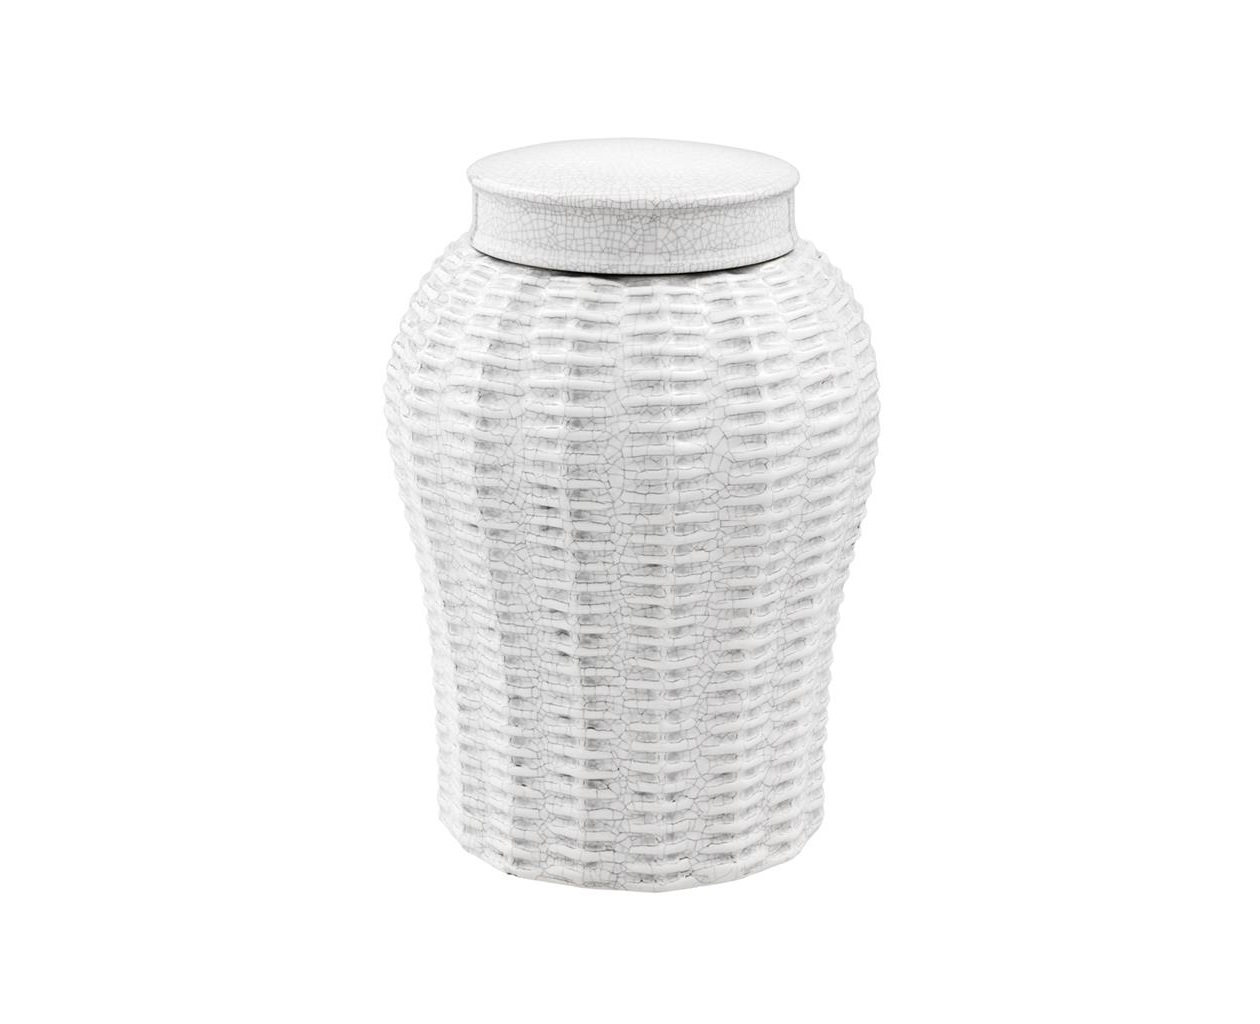 ВазаВазы<br>Ваза Vase Fort Meyers S выполнена из керамики белого цвета.<br><br>Material: Керамика<br>Height см: 26<br>Diameter см: 18